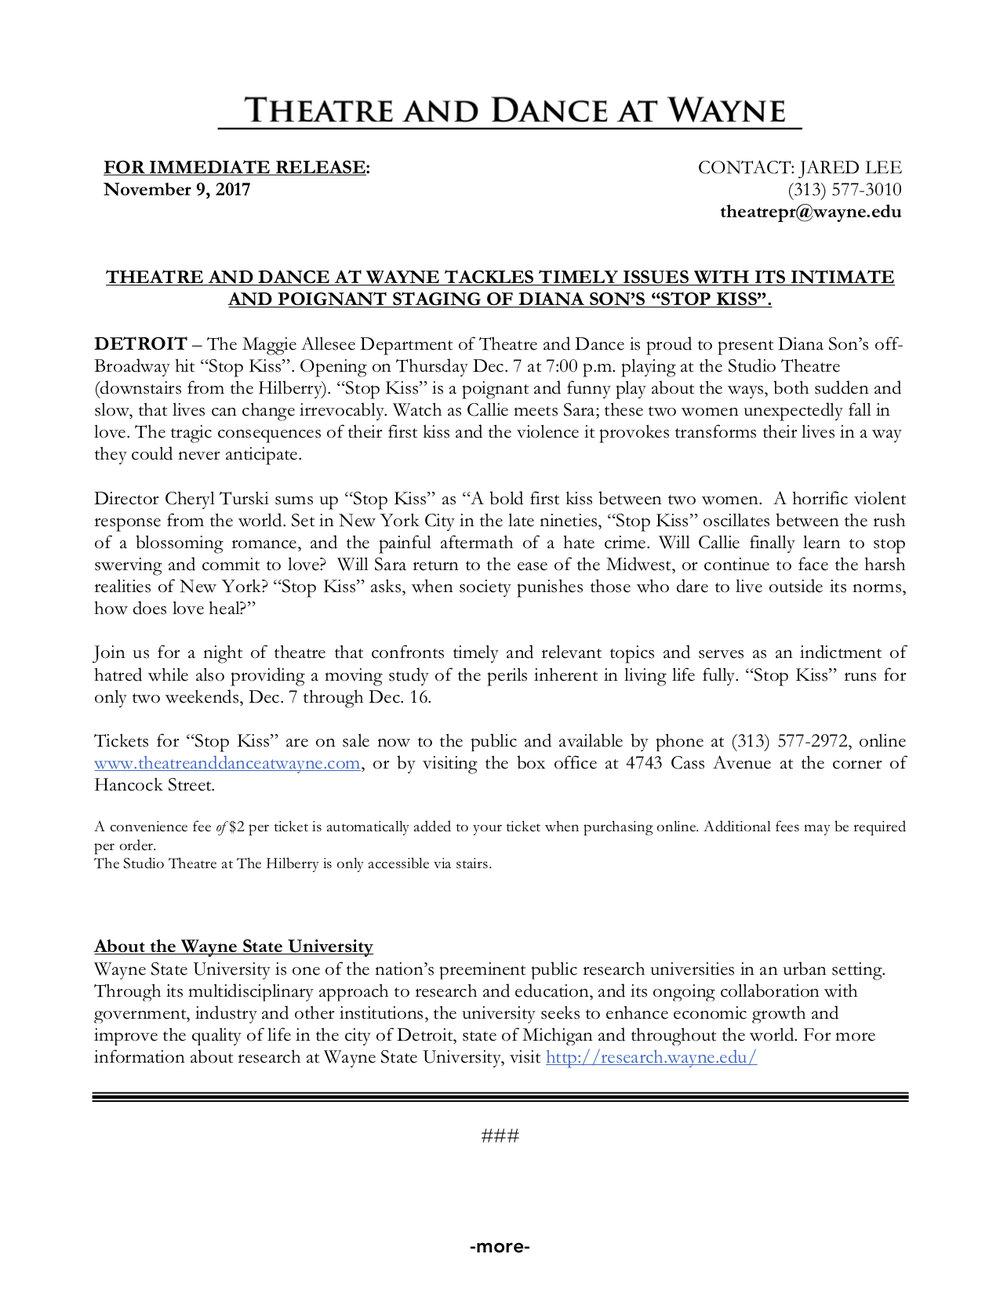 Stop Kiss press release .jpg